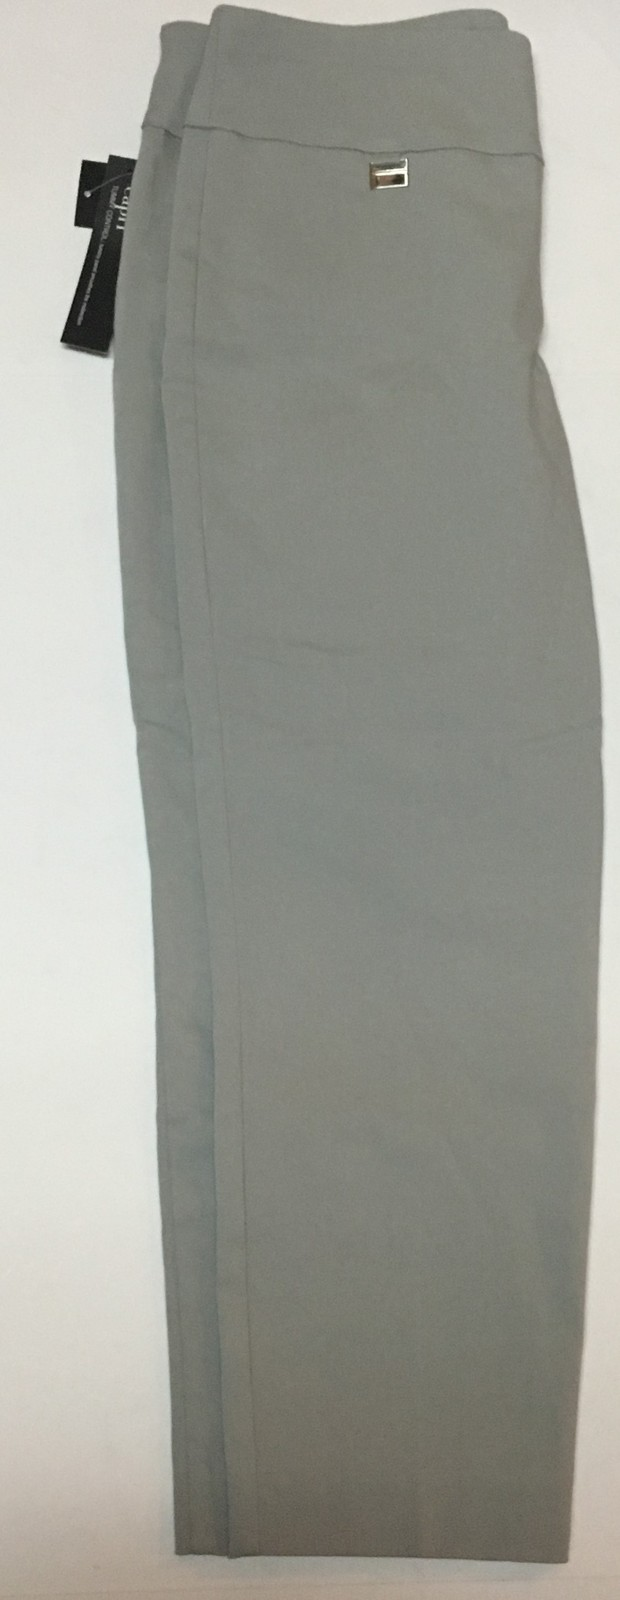 Alfani Ash Gray Capri Sz 6 Stretch